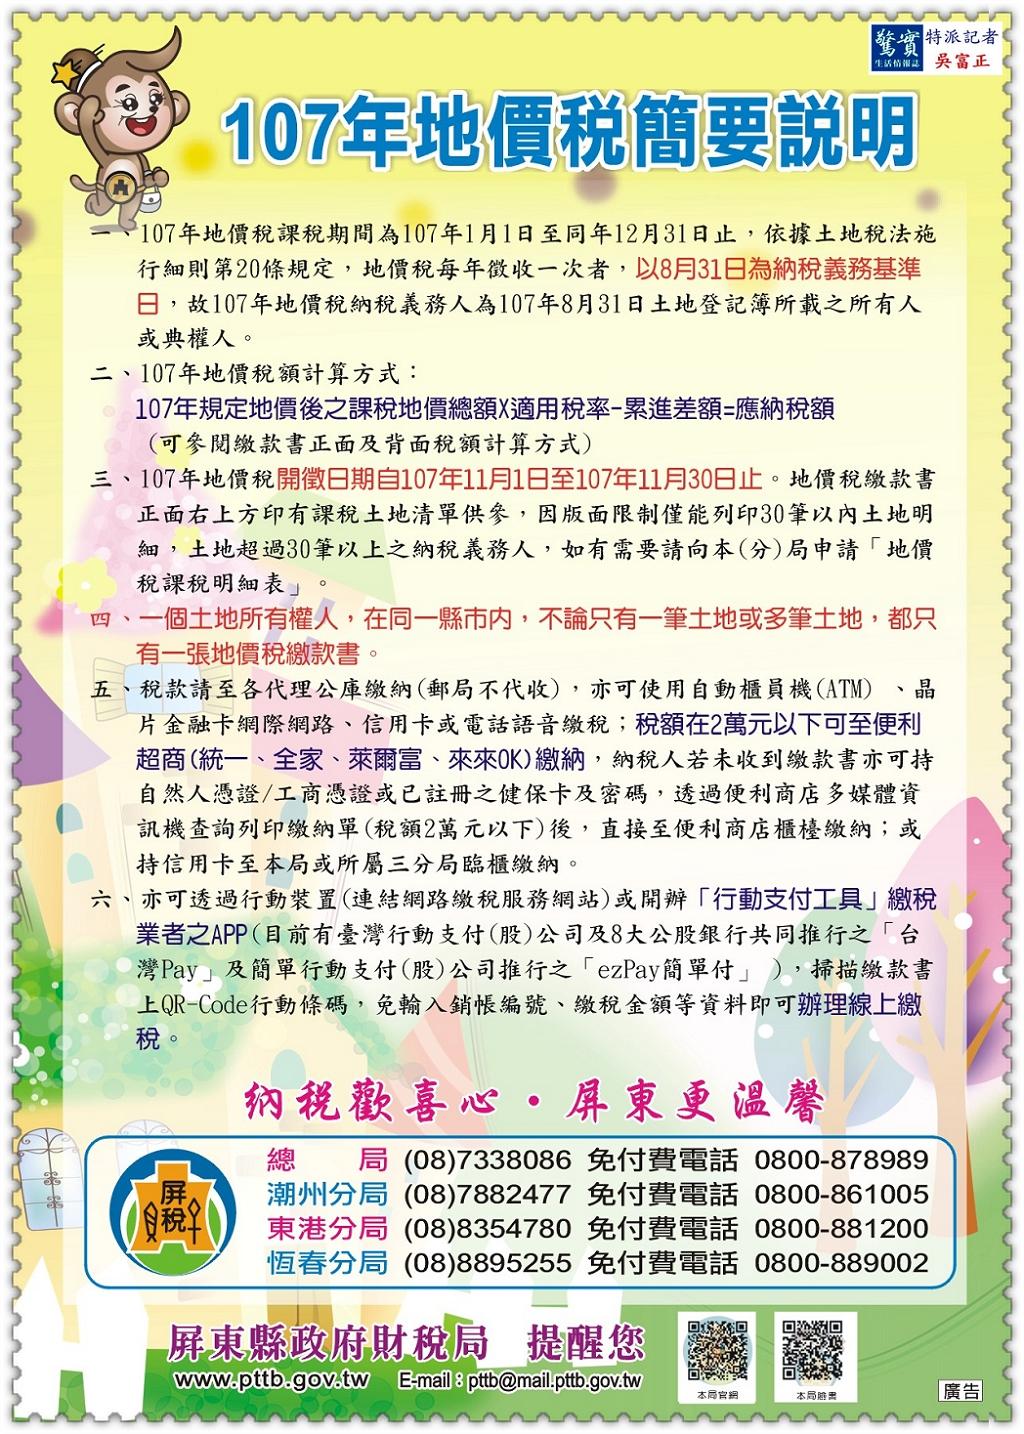 20181031b(驚實報)-屏東縣財稅局地價稅開徵提供新住民4國通譯05